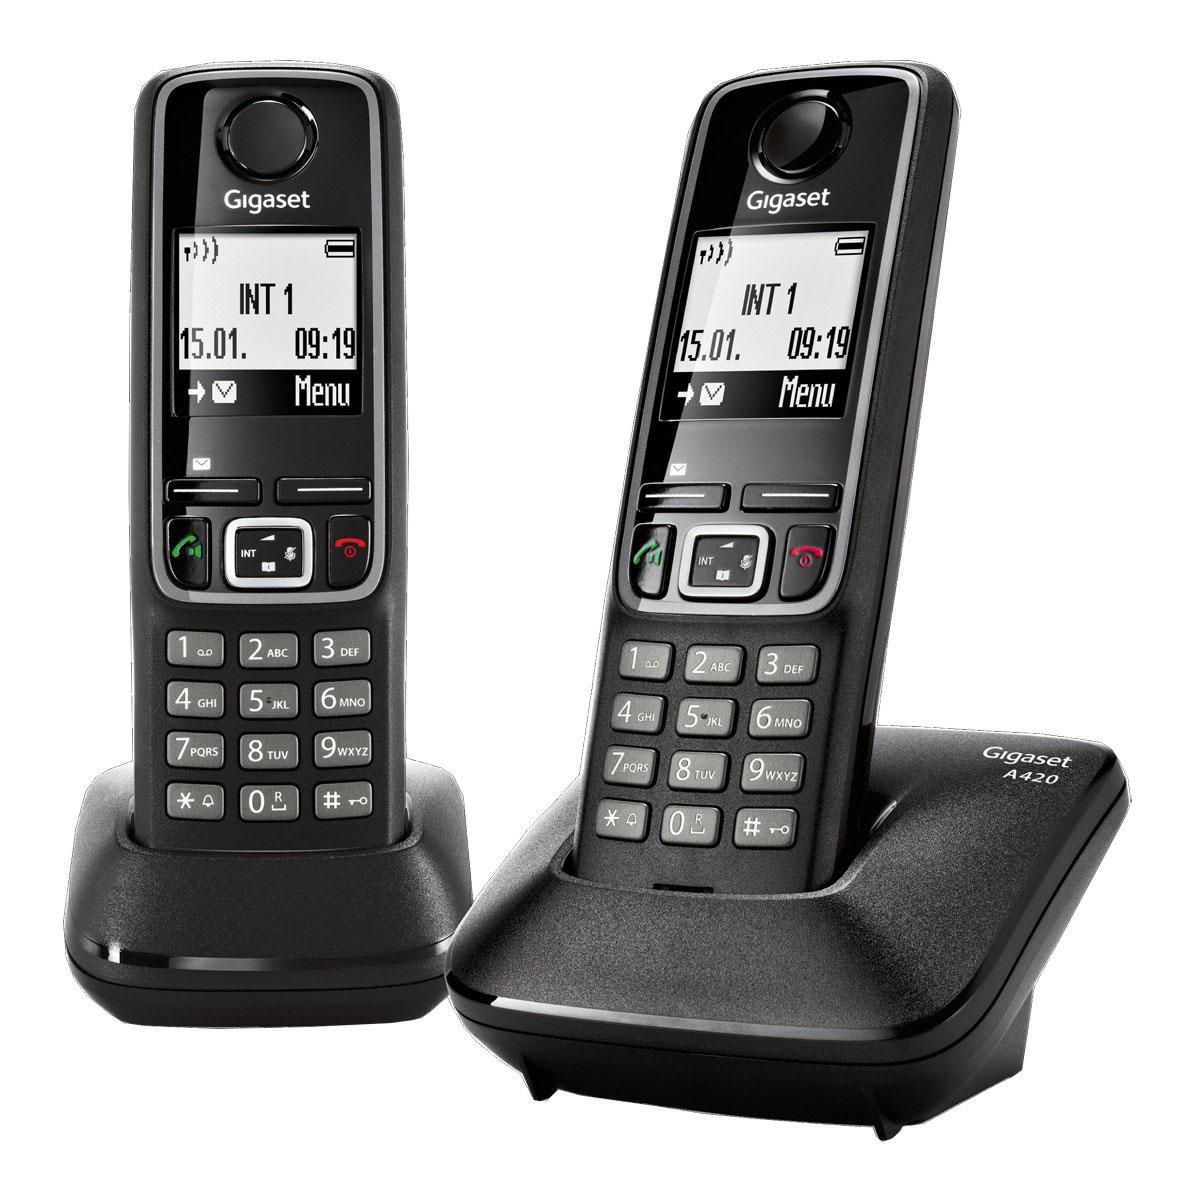 gigaset a420 duo noir t l phone sans fil gigaset sur. Black Bedroom Furniture Sets. Home Design Ideas